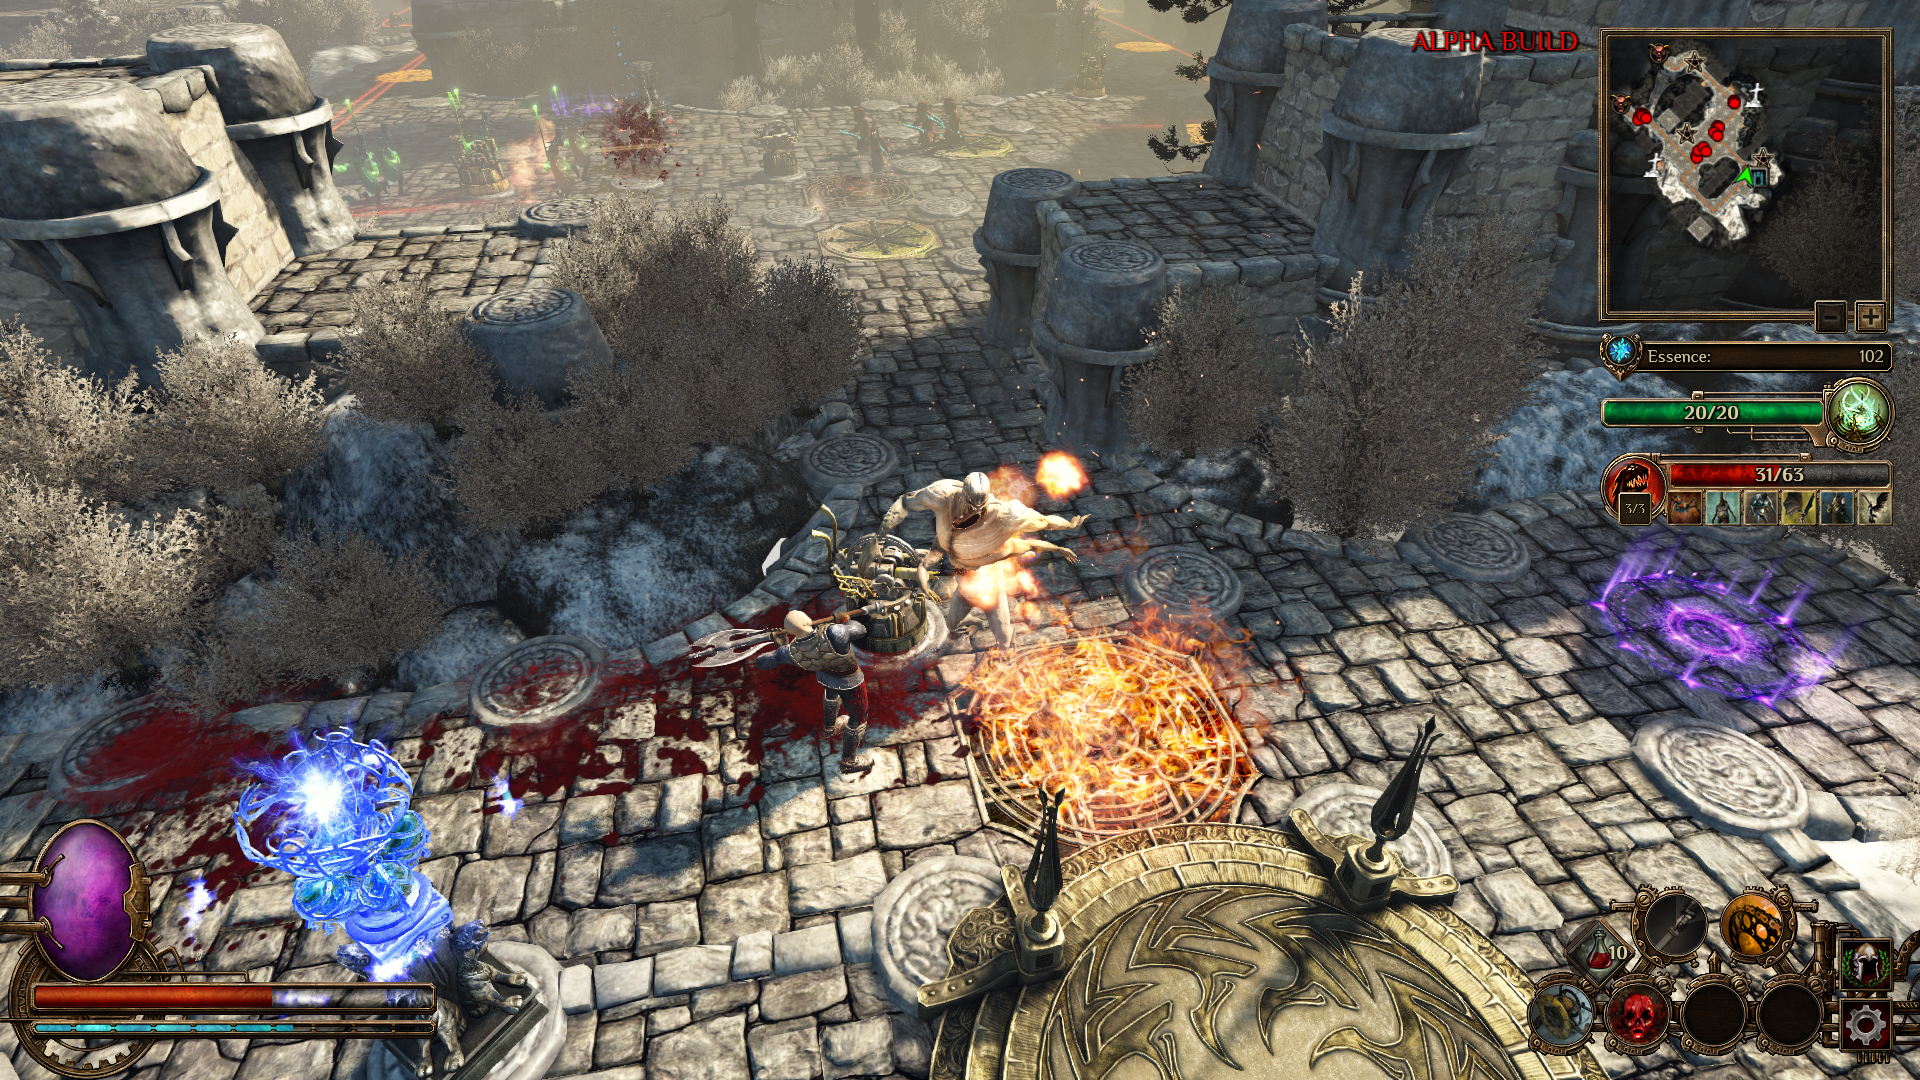 Deathtrap screenshot